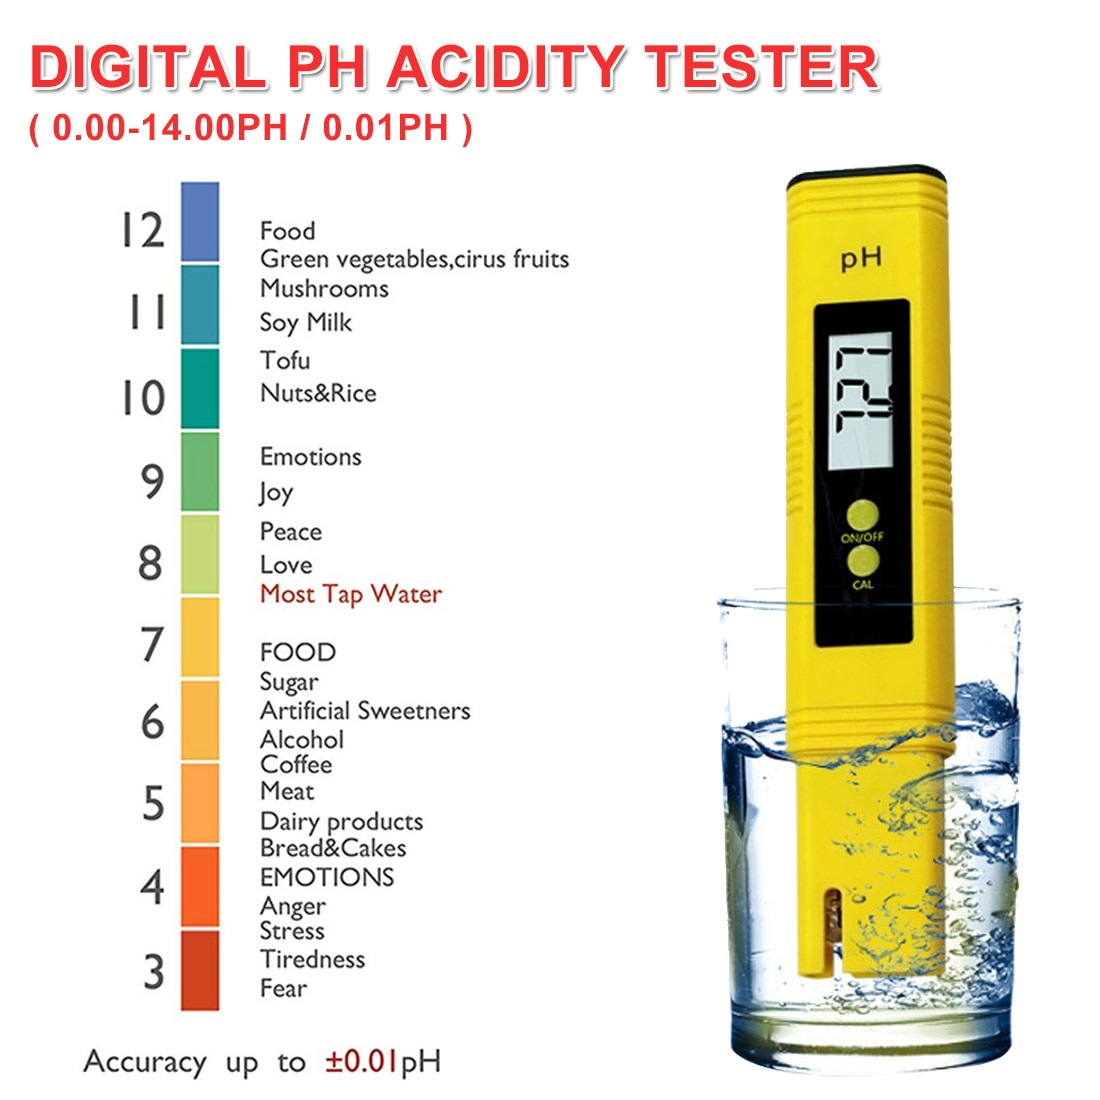 Large LCD Display Digital PH Meter Tester for Water Food Aquarium Pool Hydroponics Pocket Size Pen Type PH Tester Accuracy 0.01